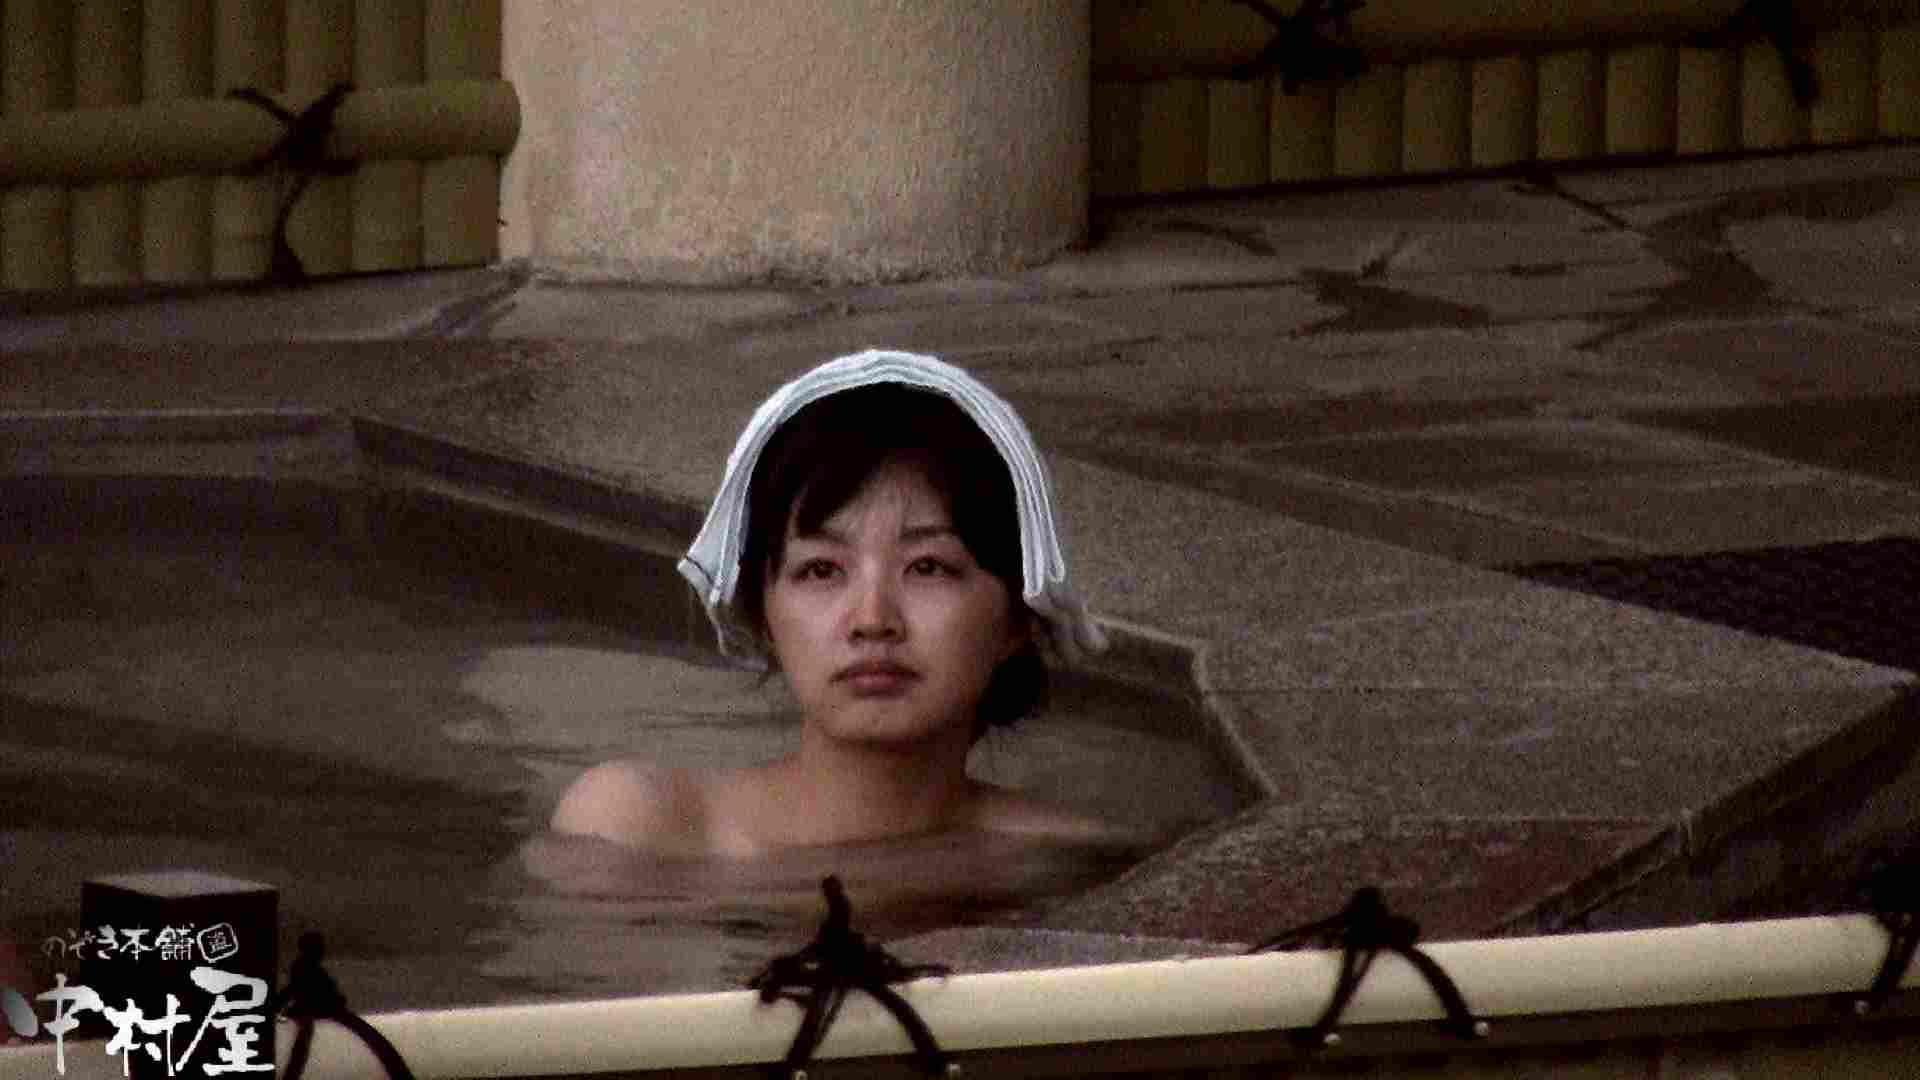 Aquaな露天風呂Vol.916 いやらしいOL  75連発 24